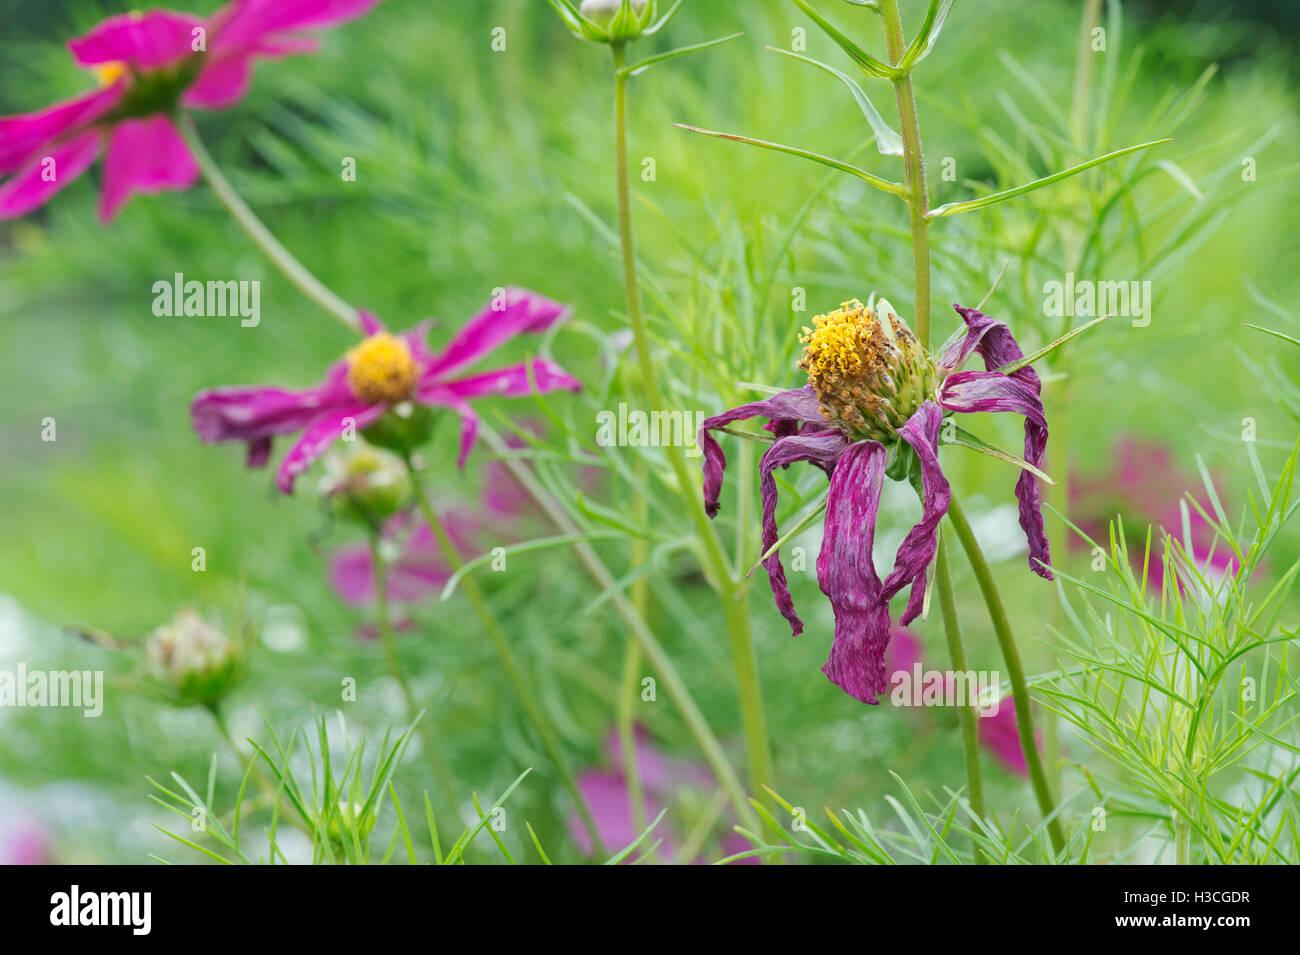 Spent Cosmos bipinnatus flower - Stock Image